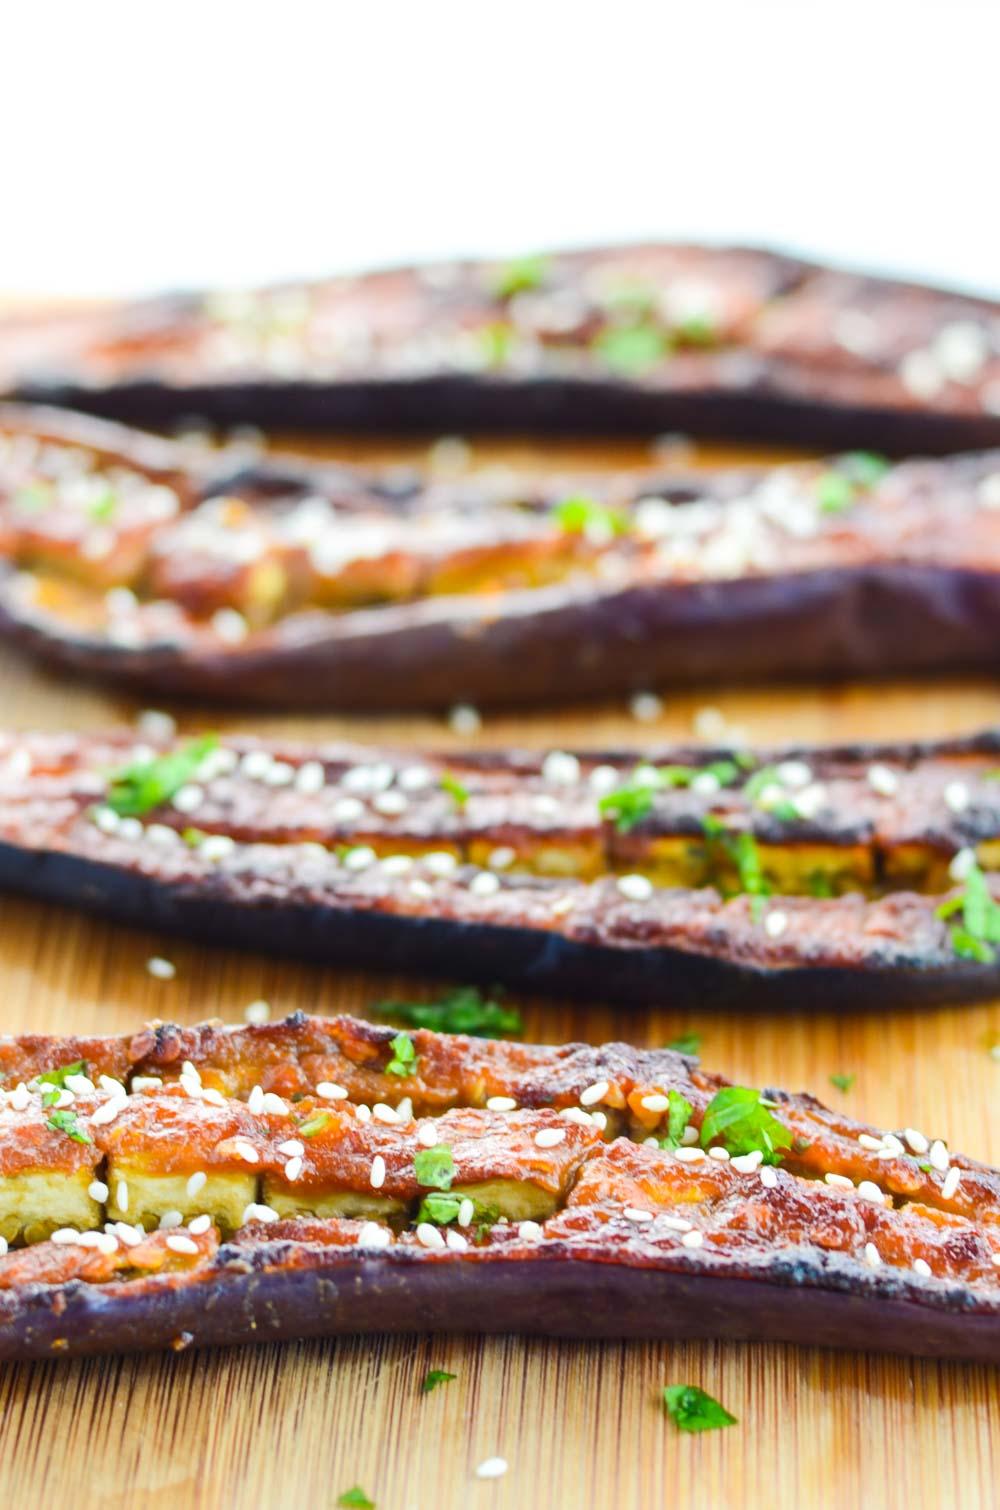 Miso Glazed Eggplant or Dengaku Nasu is another amazing way to enjoy ...